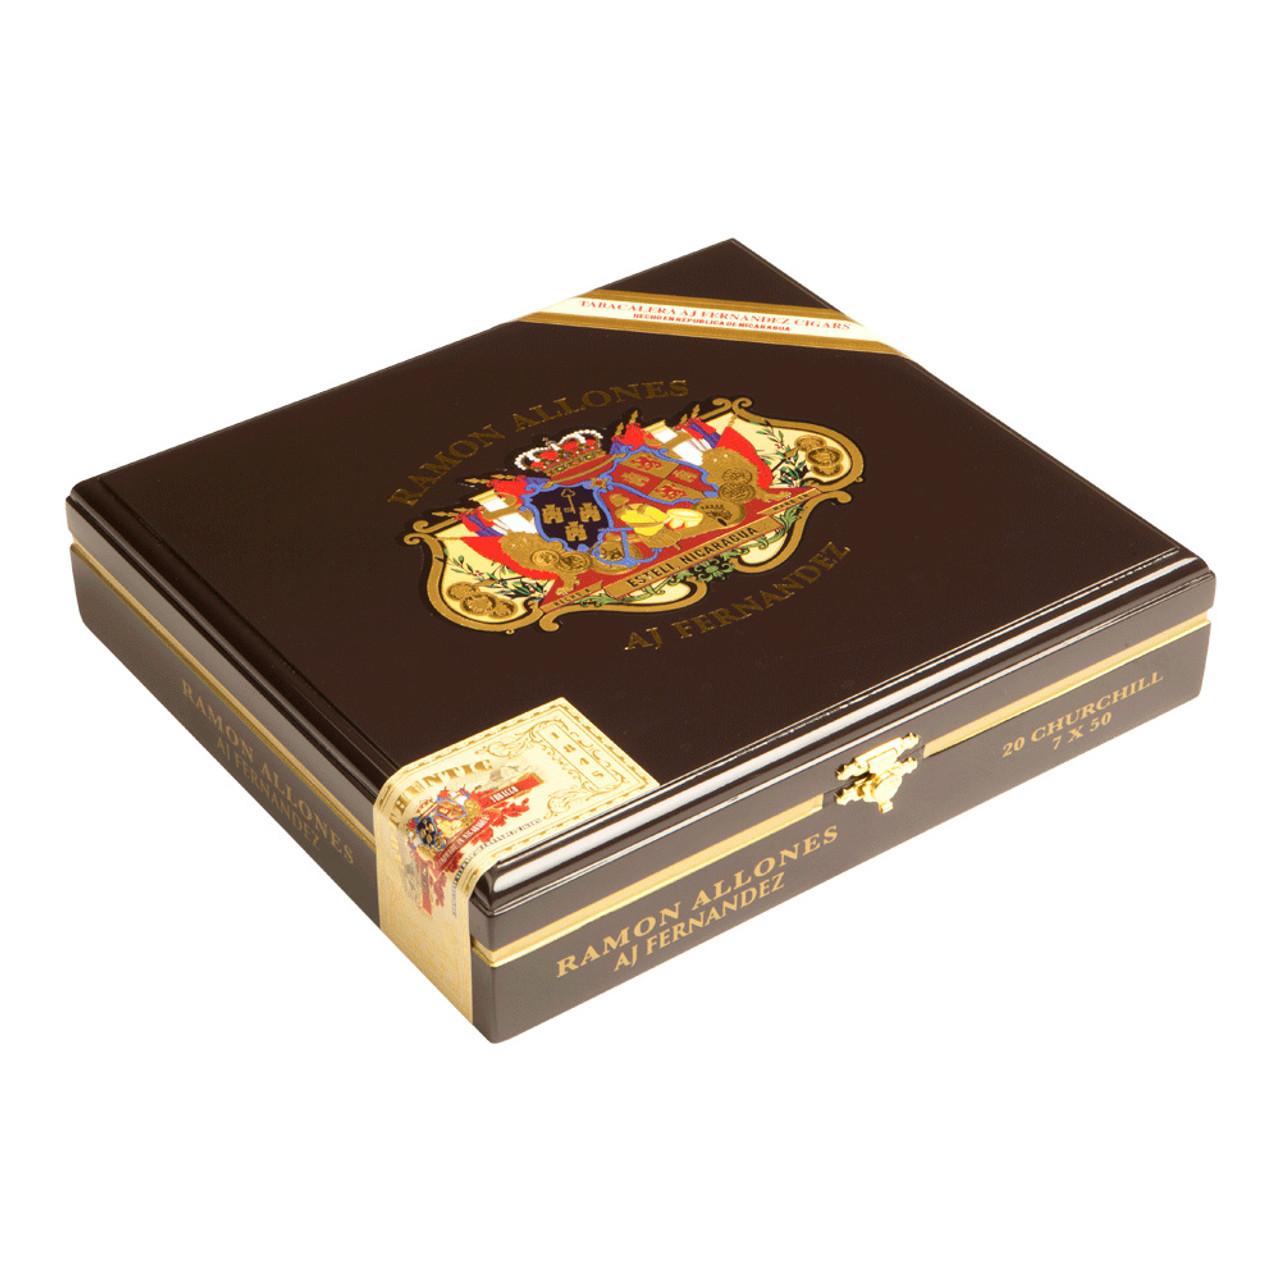 Ramon Allones by AJ Fernandez Robusto Cigars - 5.5 x 50 (Box of 20)